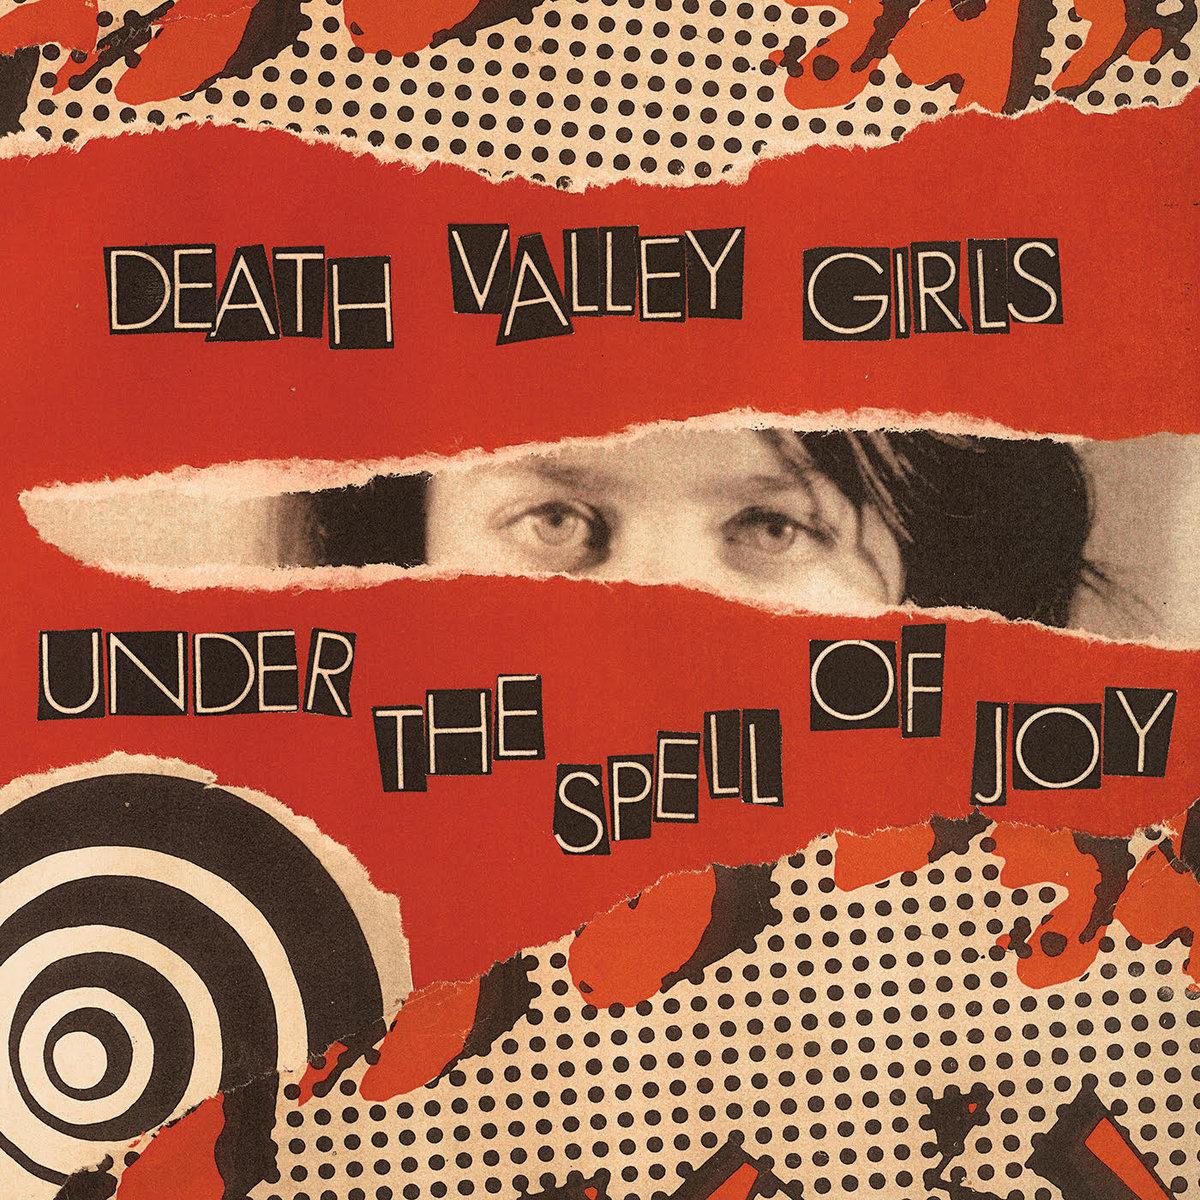 News – Death Valley Girls – Under the Spell of Joy